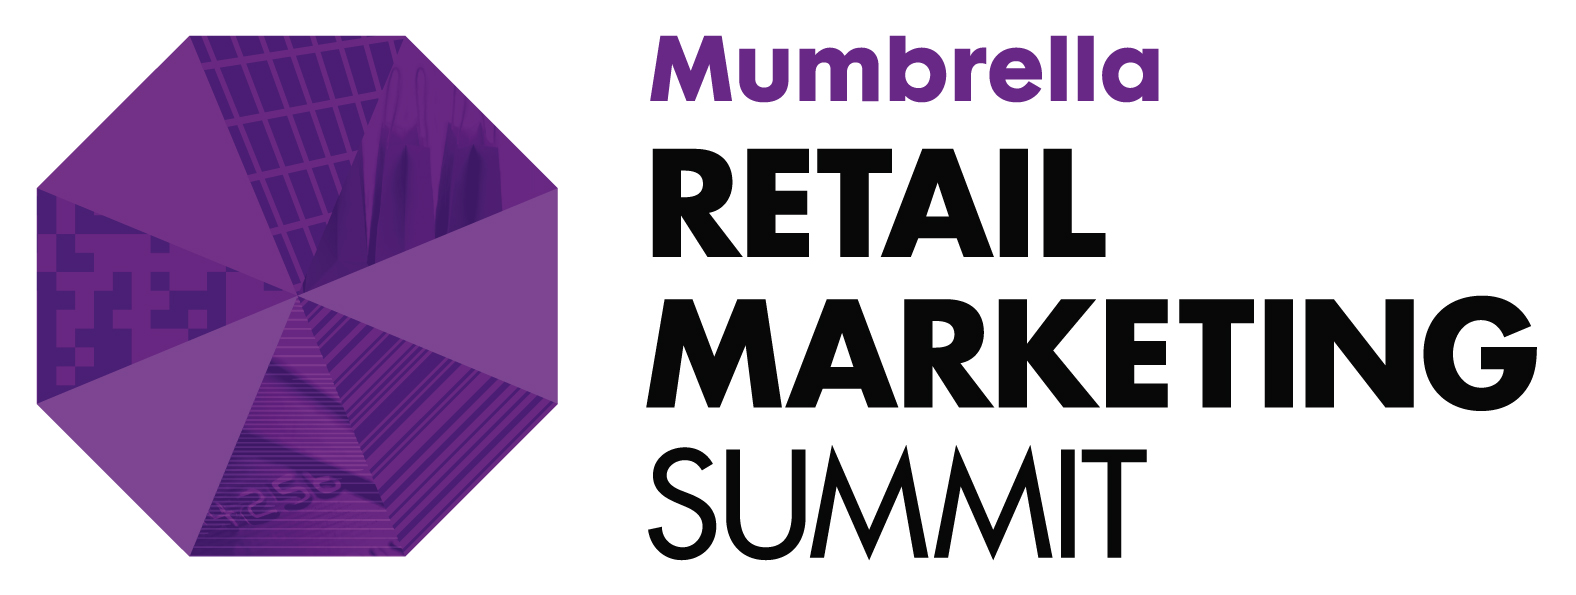 ubiquity-lab-mumbrella-retail.jpg